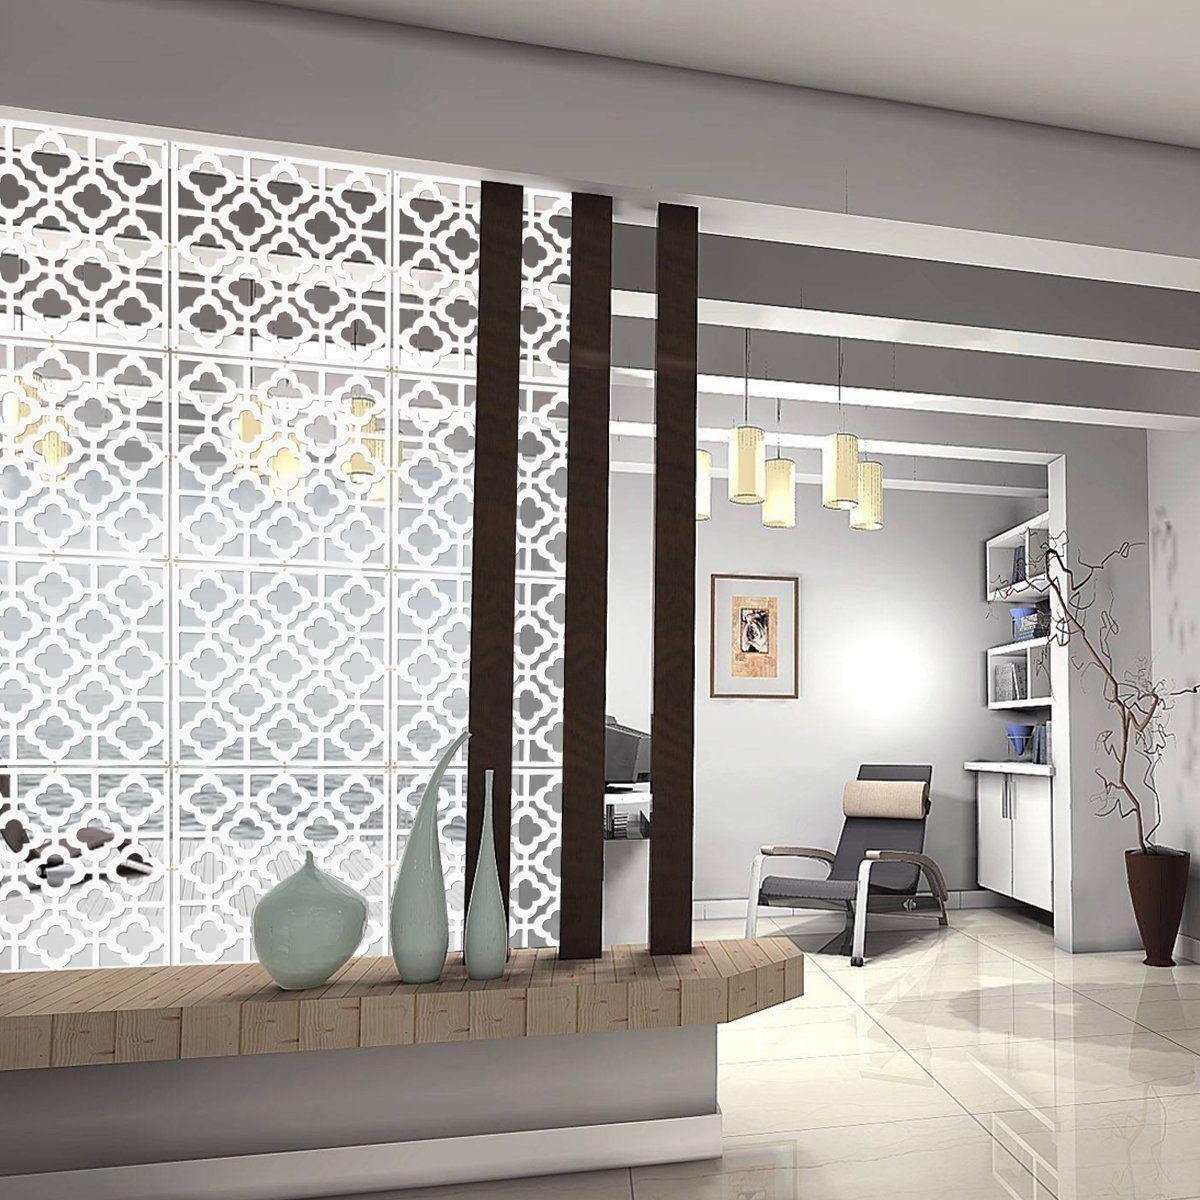 Kernorv Hanging Room Divider Decorative Screen Panels Made Of Pvc